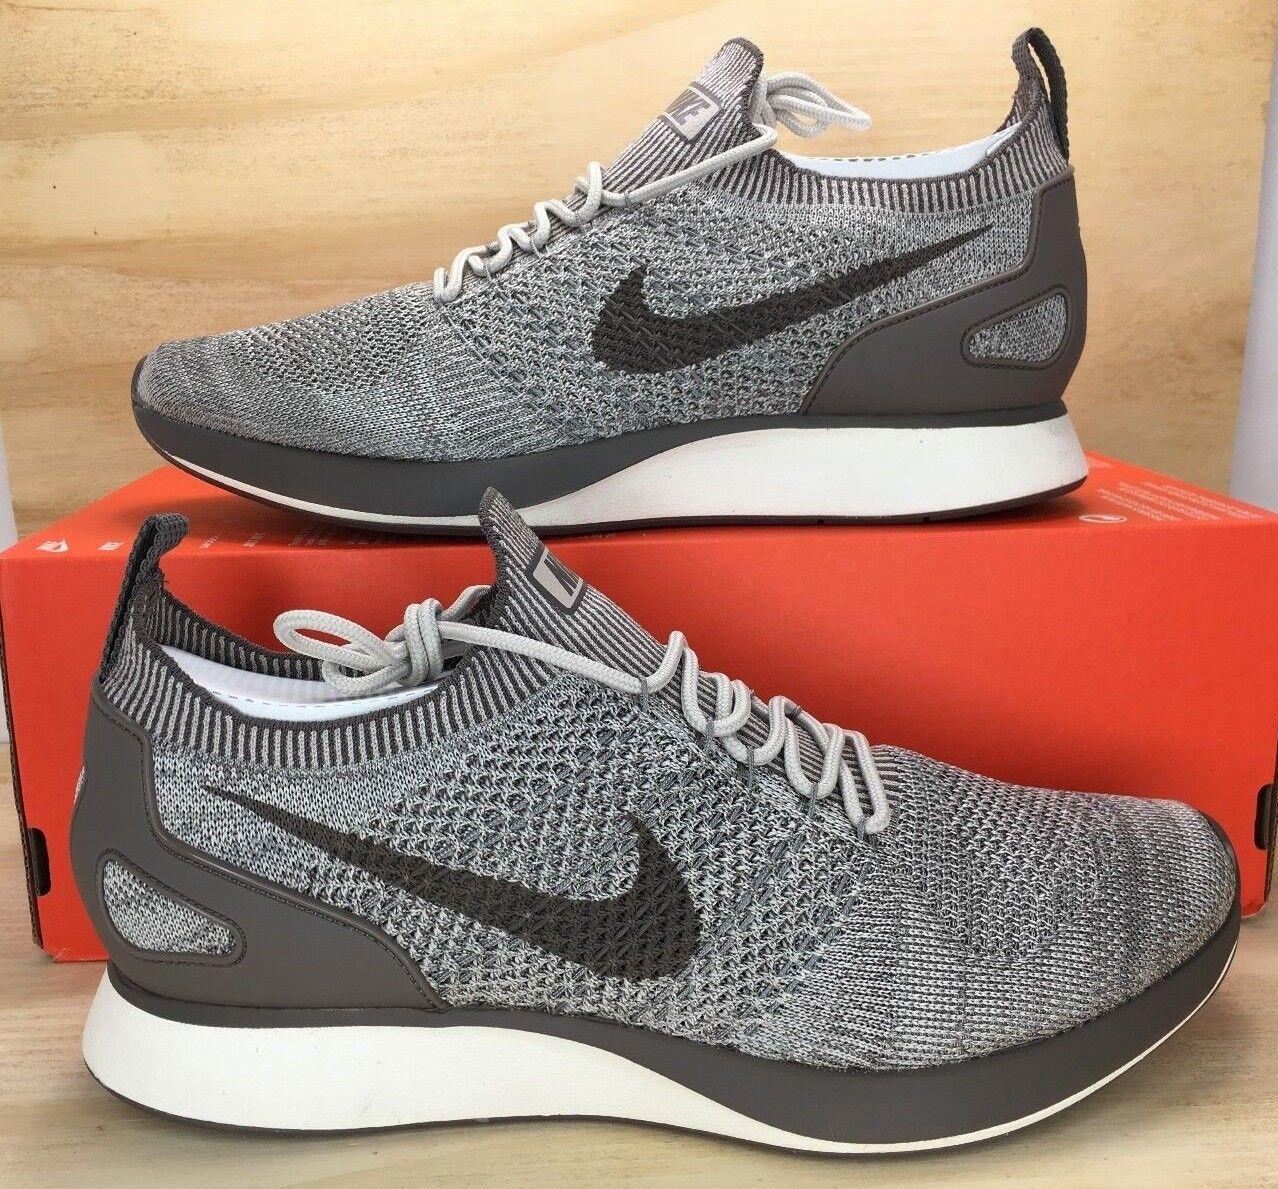 Nike Air Zoom Mariah Flyknit Racer Running Shoes 918264-200 Men Size 10.5